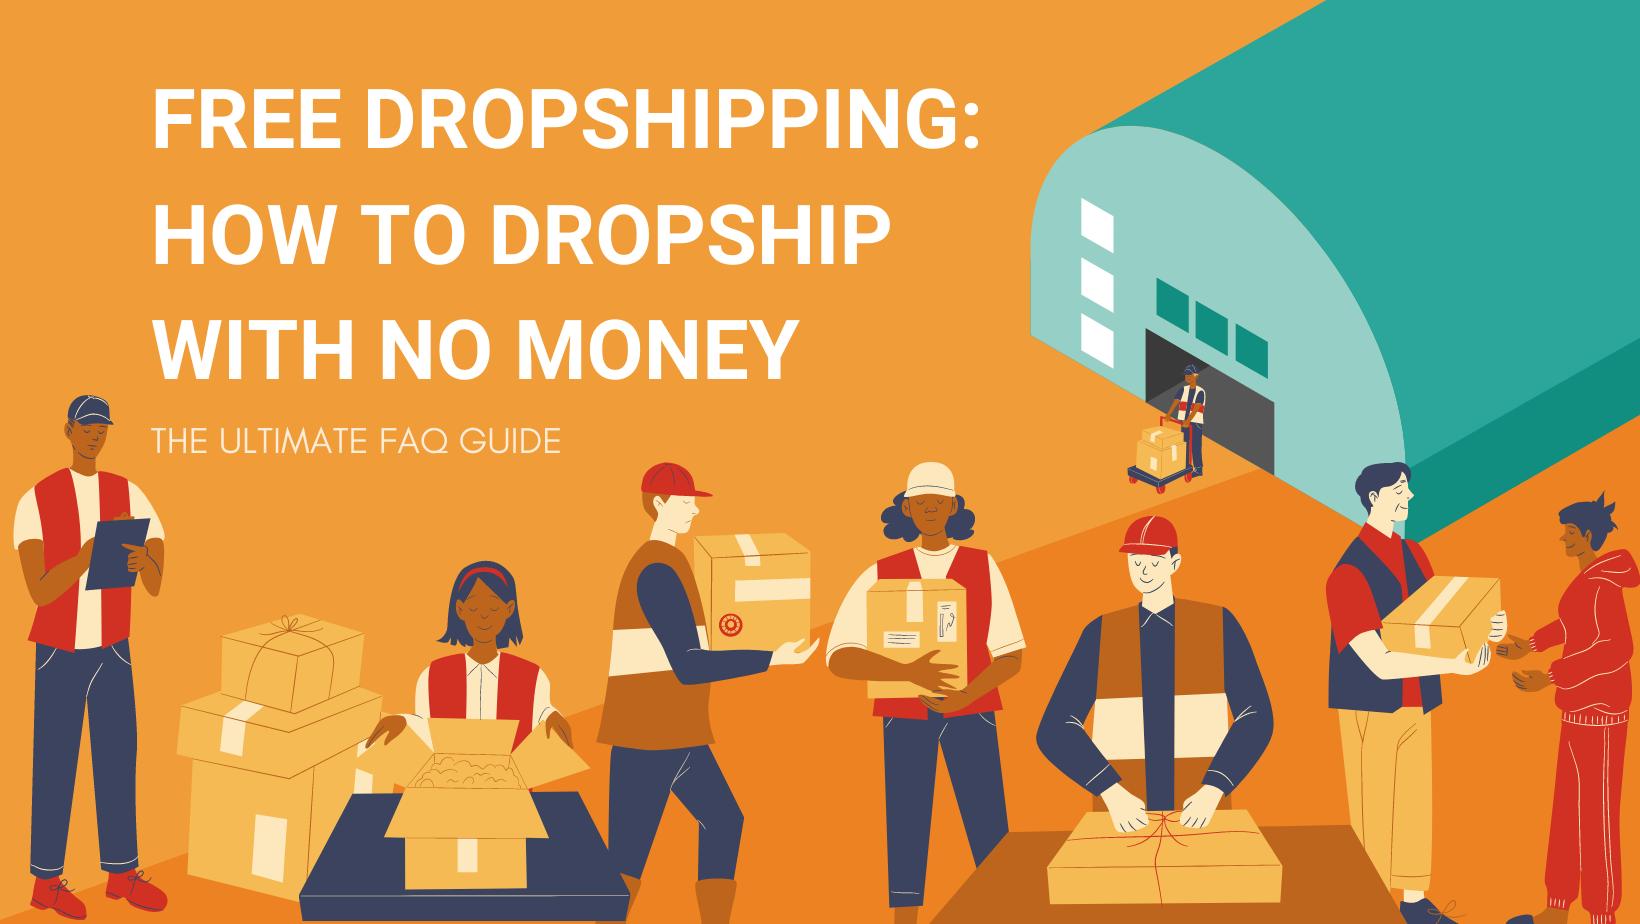 free dropshipping